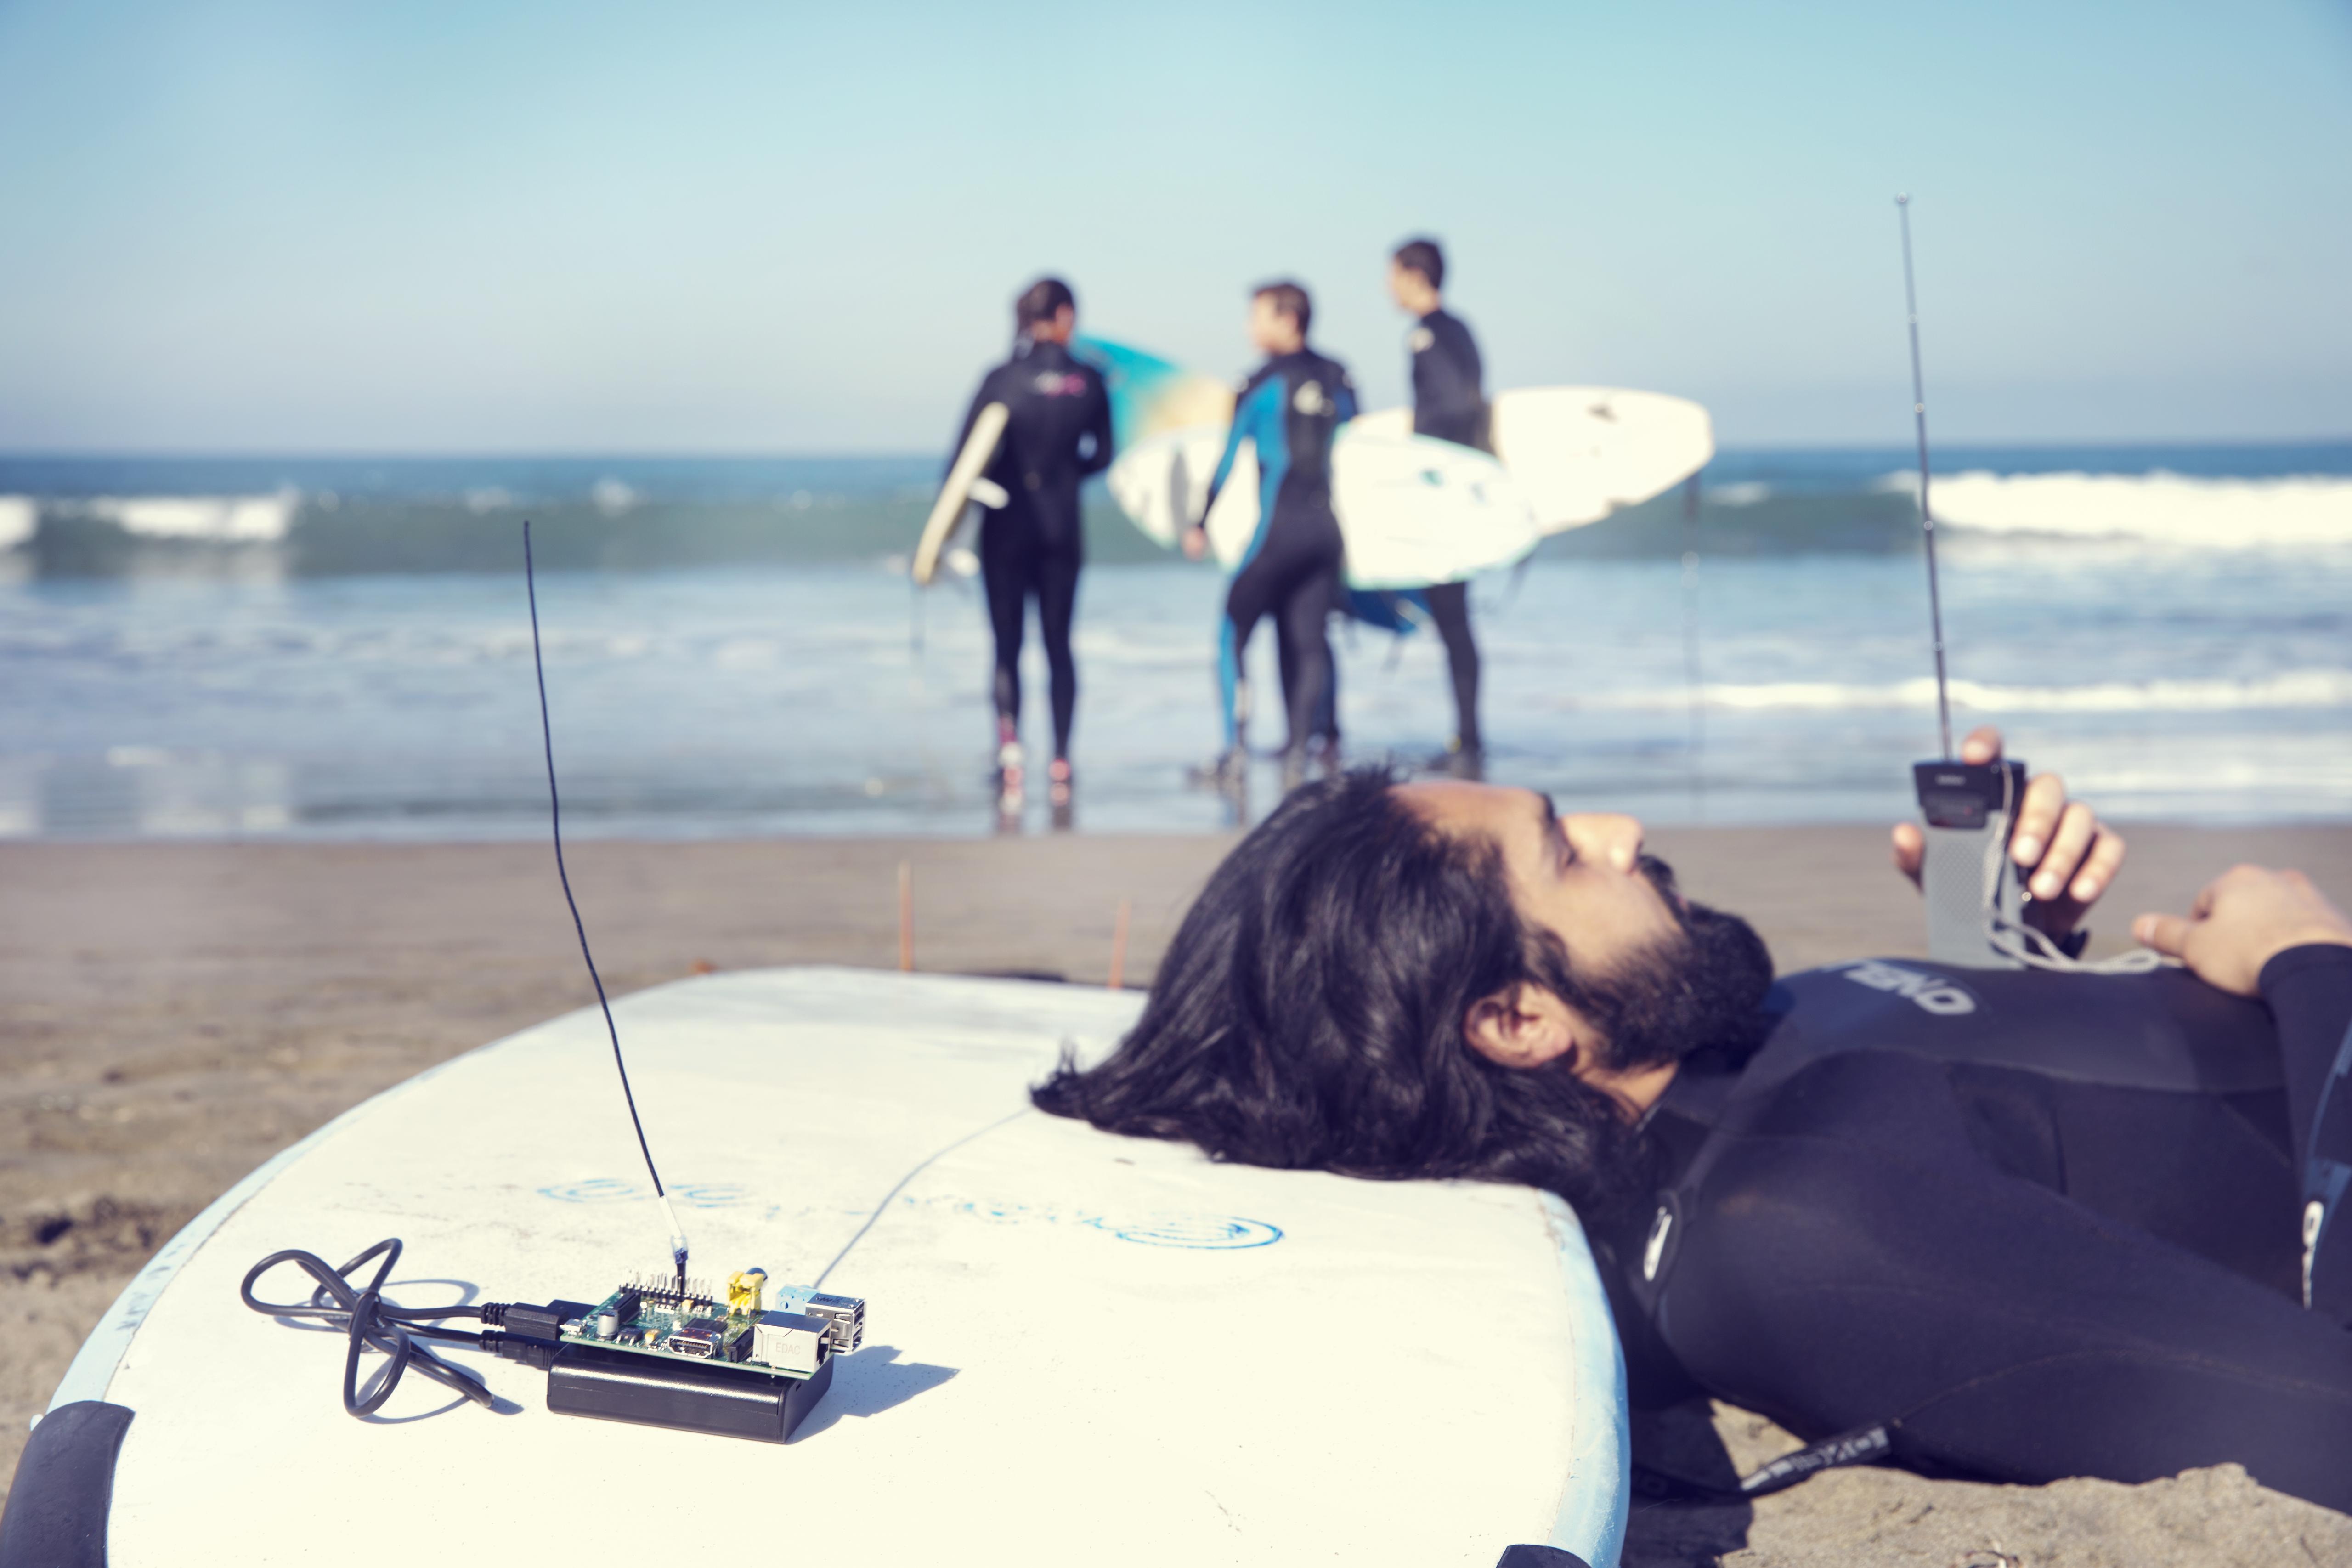 Raspberry Pirate Radio Make 100m Simple Fm Transmitter